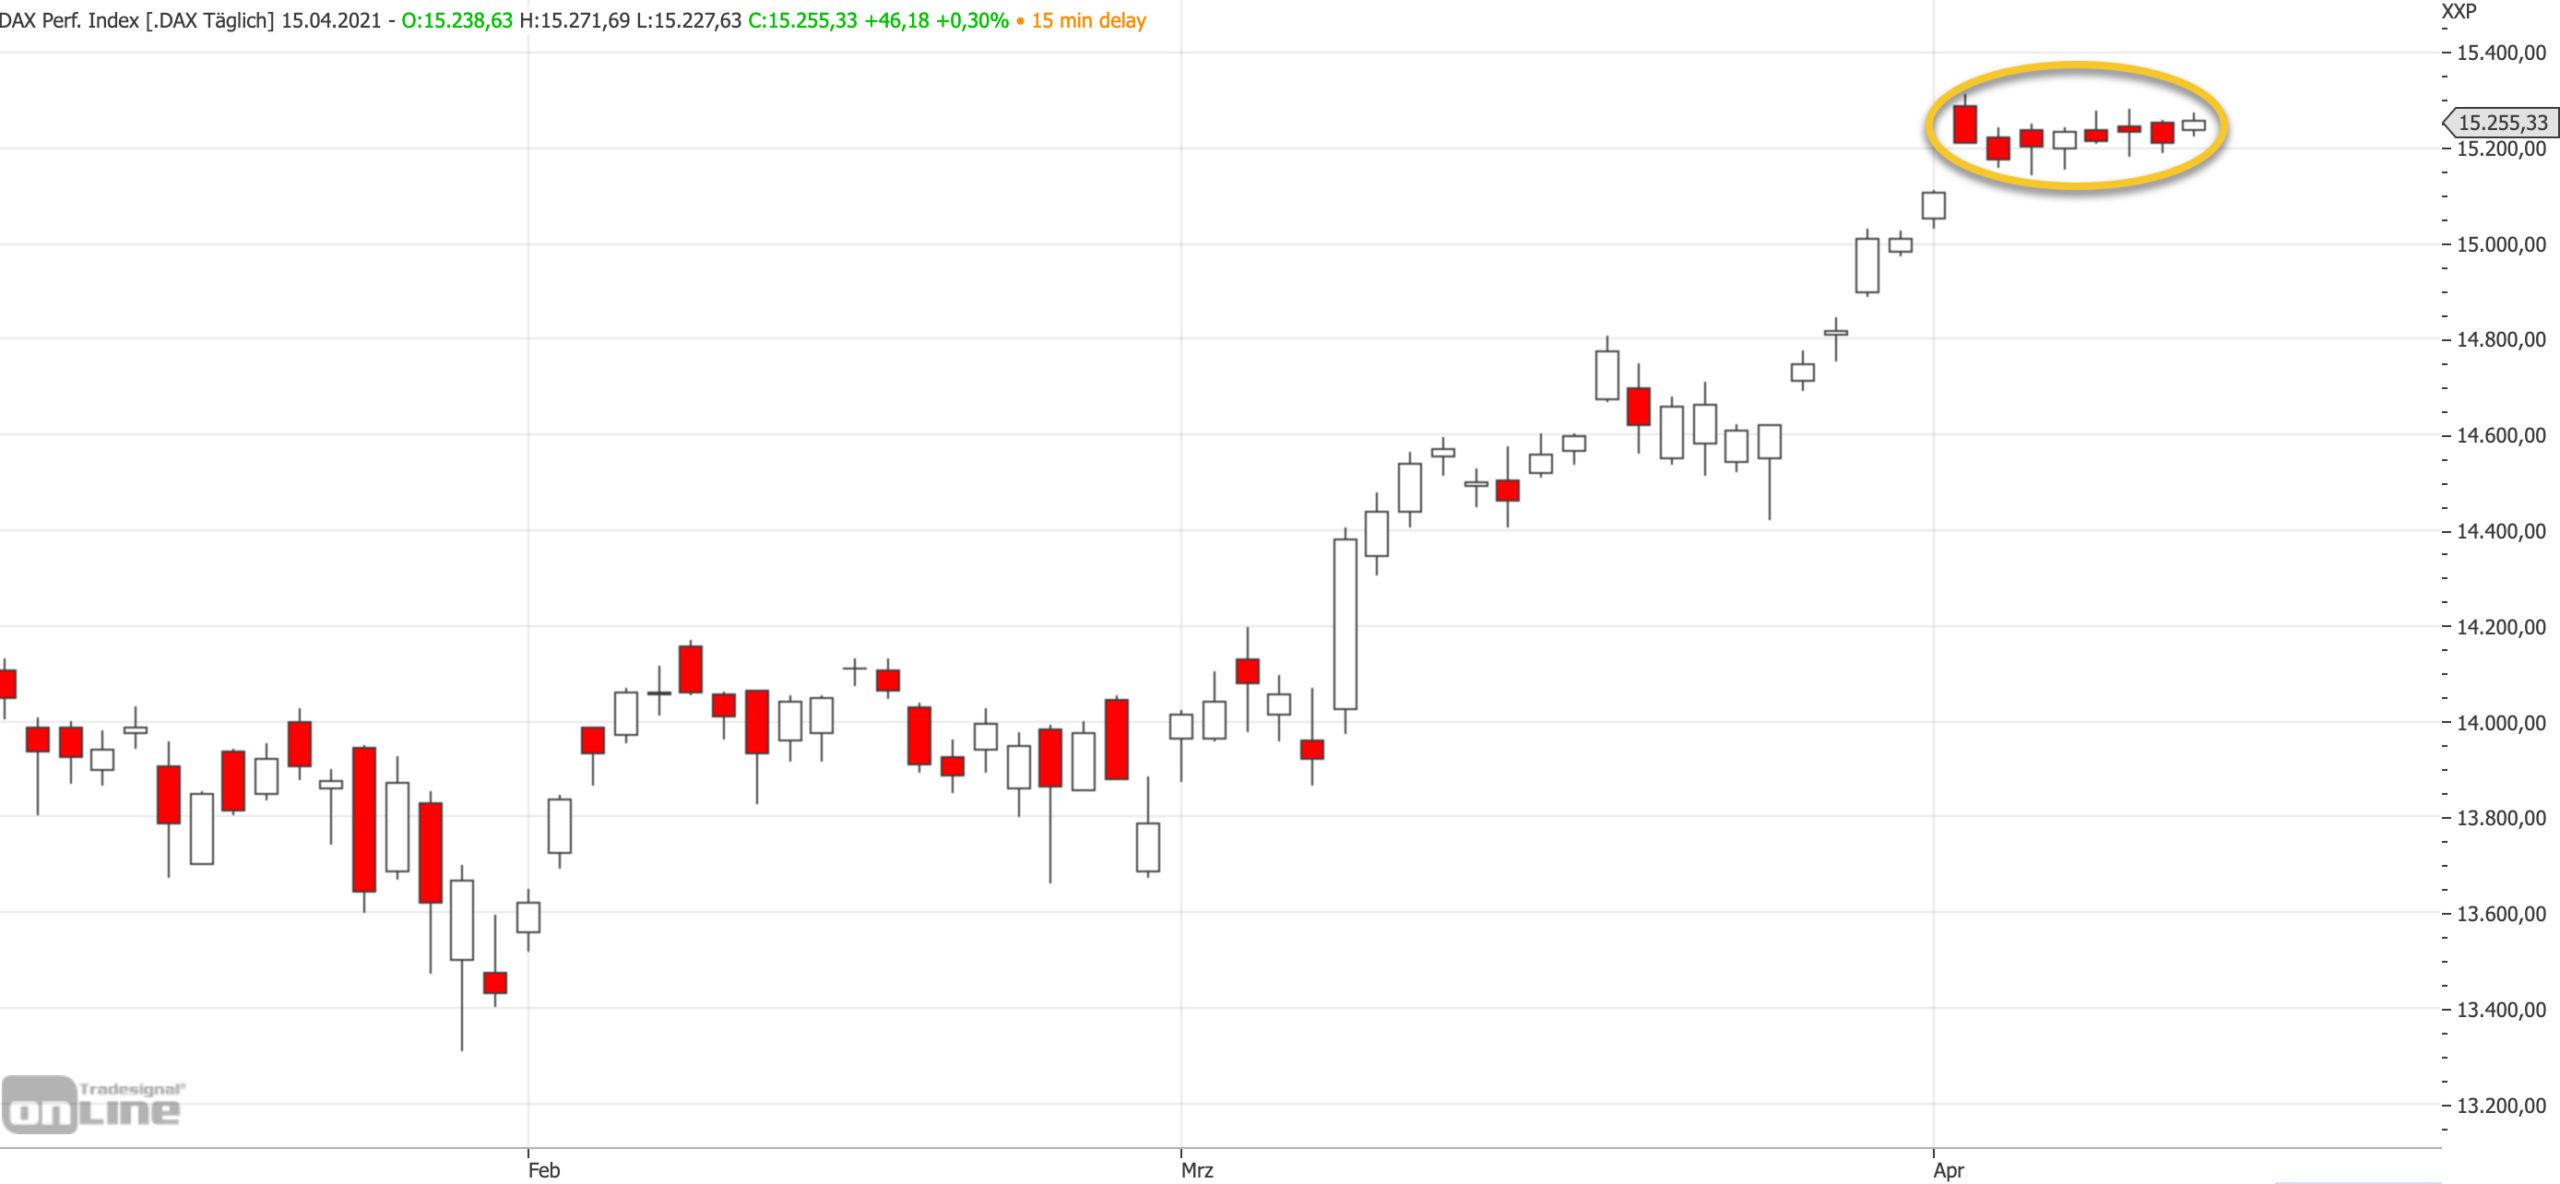 Mittelfristiger DAX-Chart am 15.04.2021